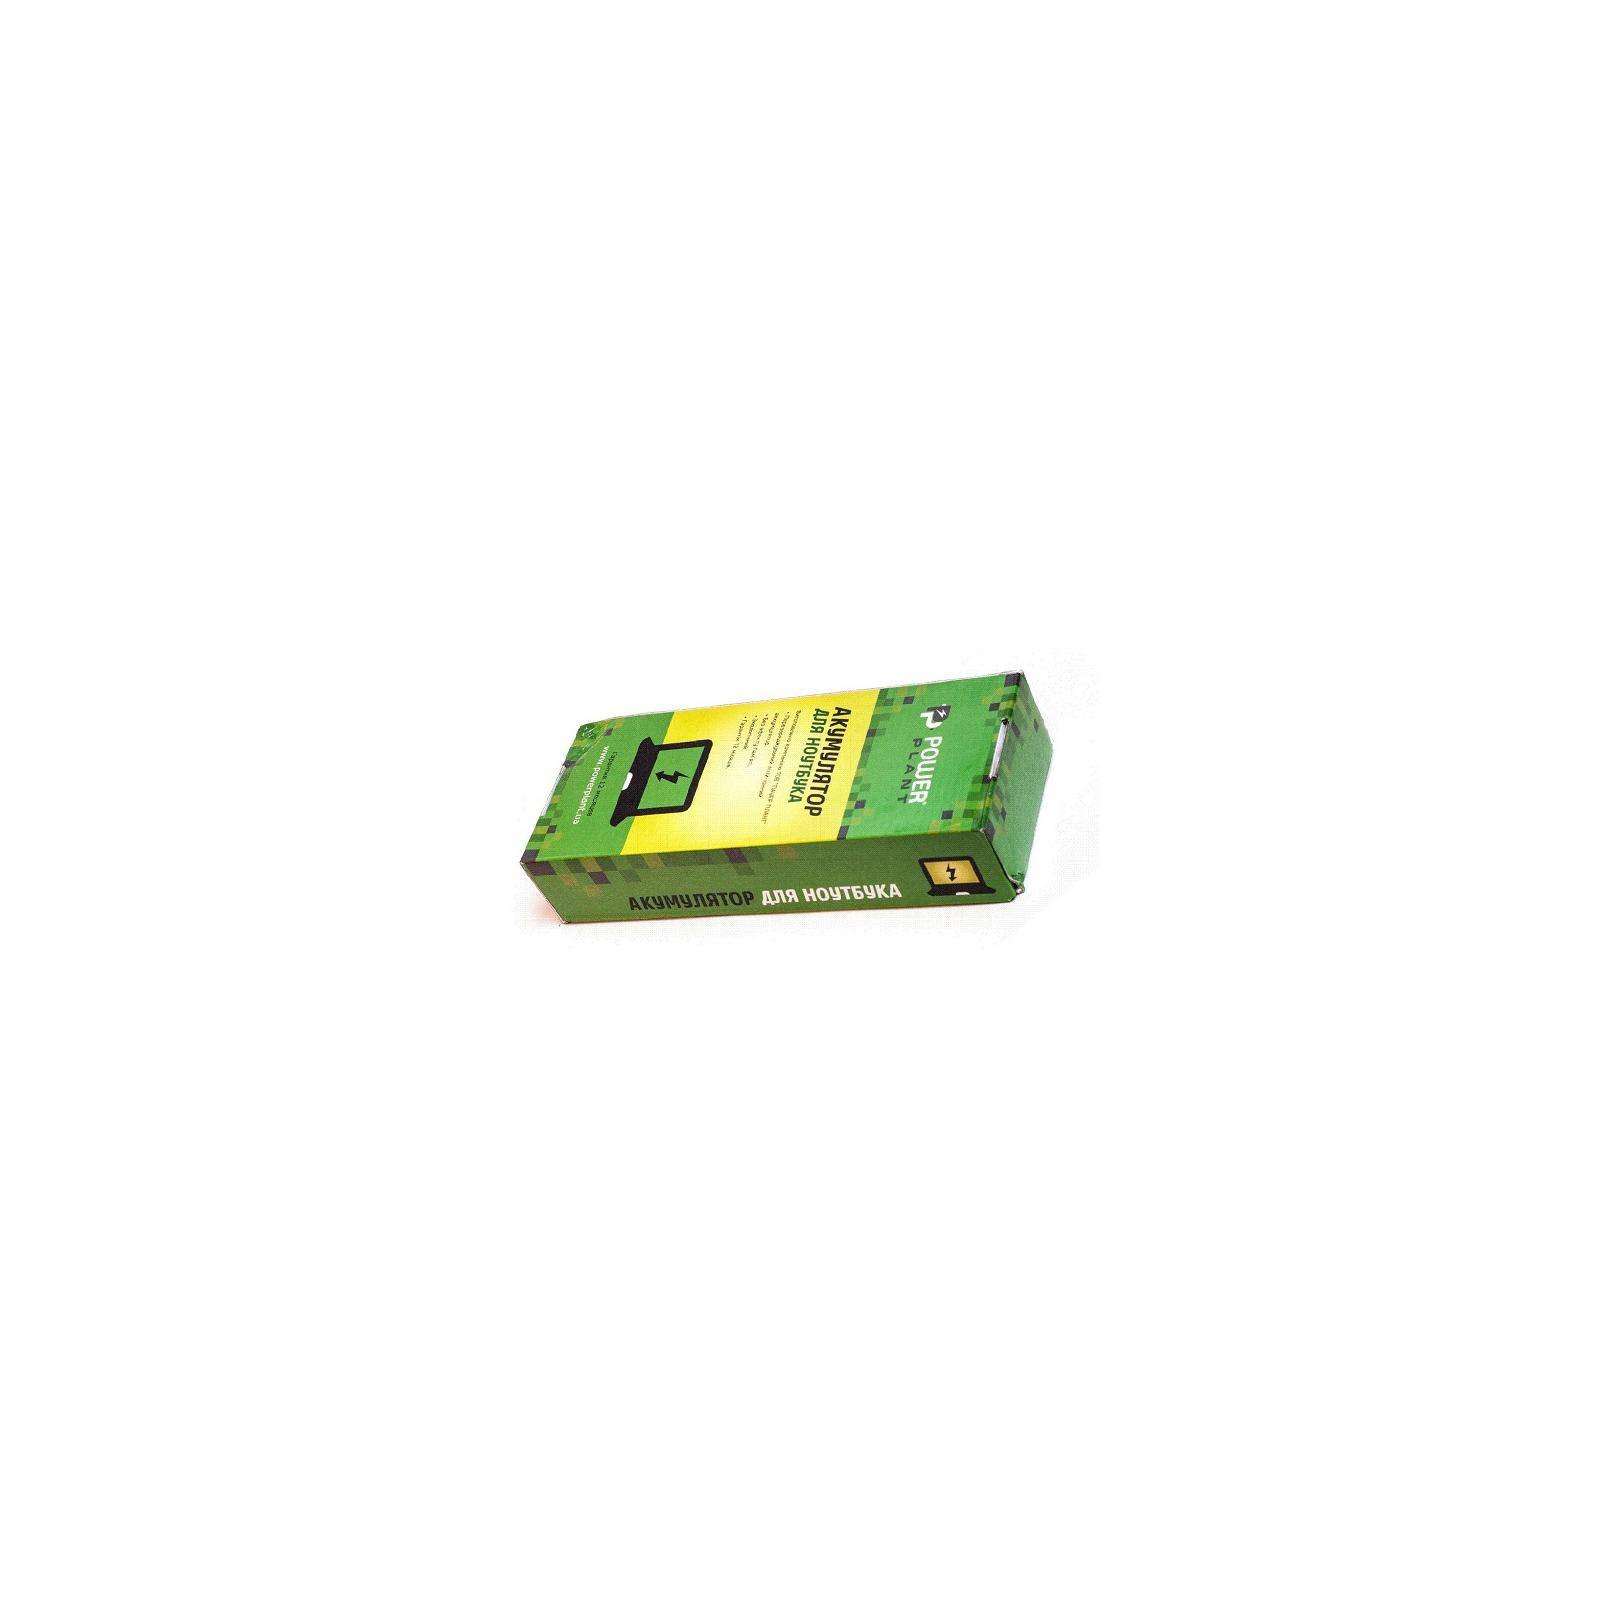 Аккумулятор для ноутбука ASUS EEE PC1005HA (AL32-1005, AS1005LH) 11.1V 5200mAh PowerPlant (NB00000102) изображение 3